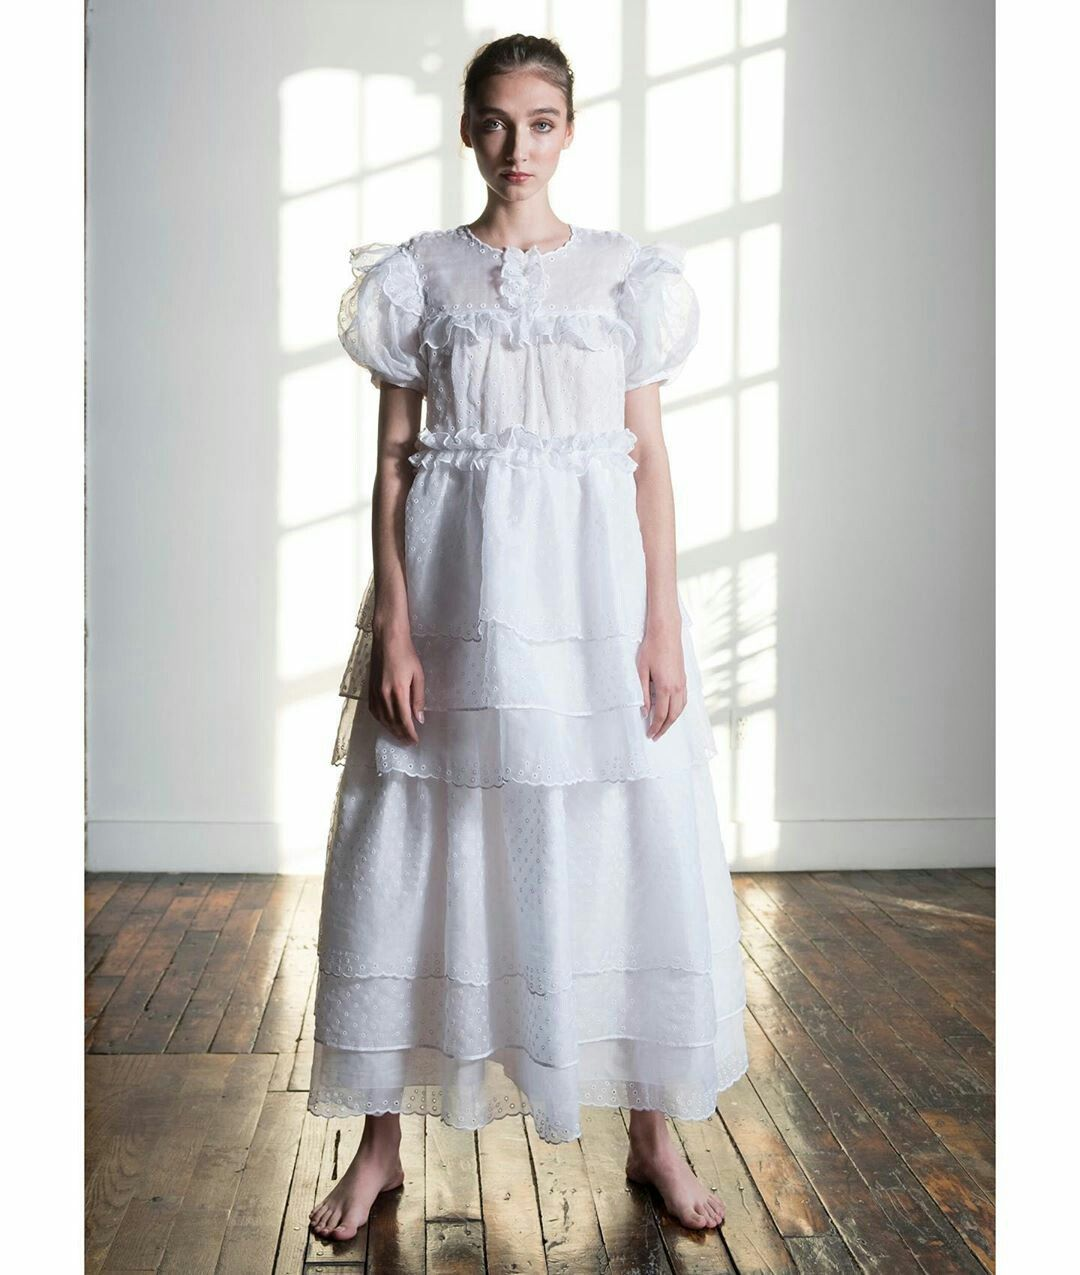 Pin By Momtaj Parveen On Victorian Dress Dresses Victorian Dress Summer Dresses [ 1275 x 1080 Pixel ]